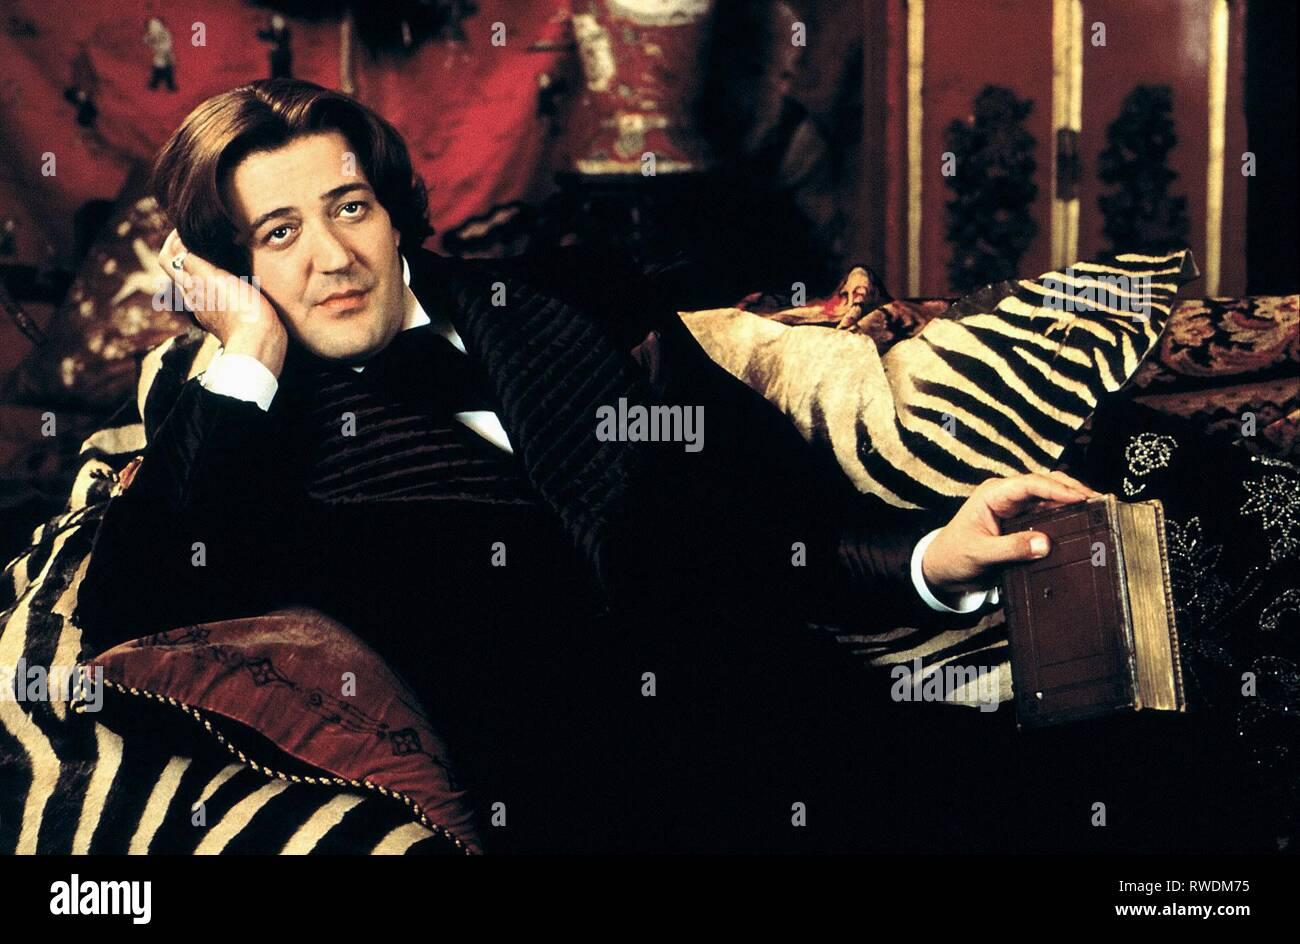 STEPHEN FRY, WILDE, 1997 - Stock Image